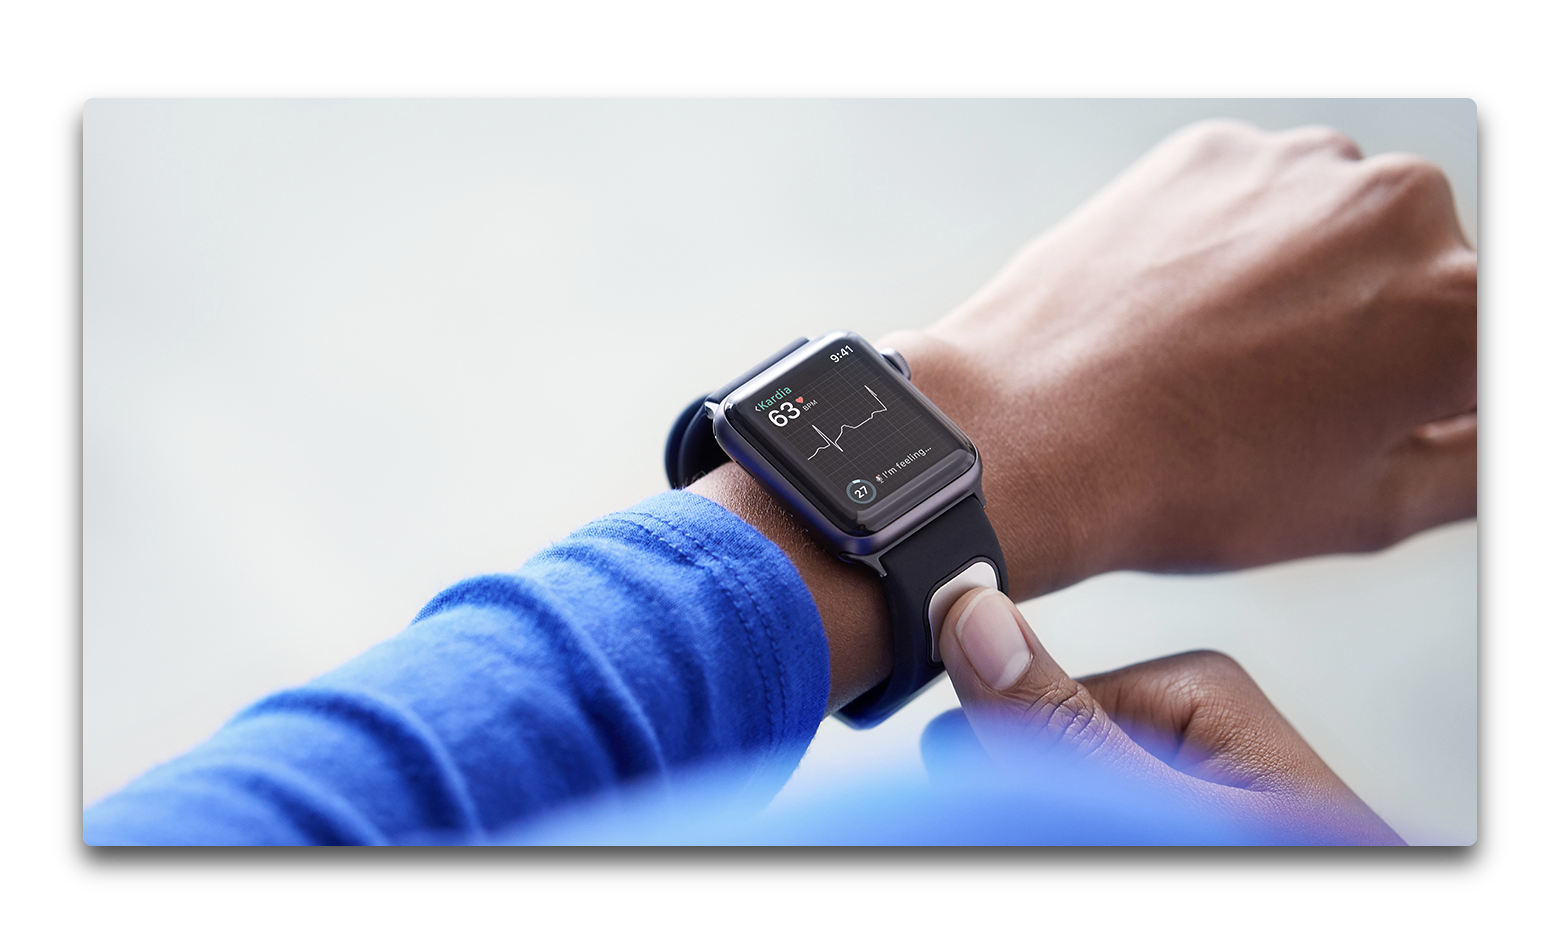 AliveCor KardiaBand、Apple Watch用に高カリウム検出用AIアルゴリズムを使用可能